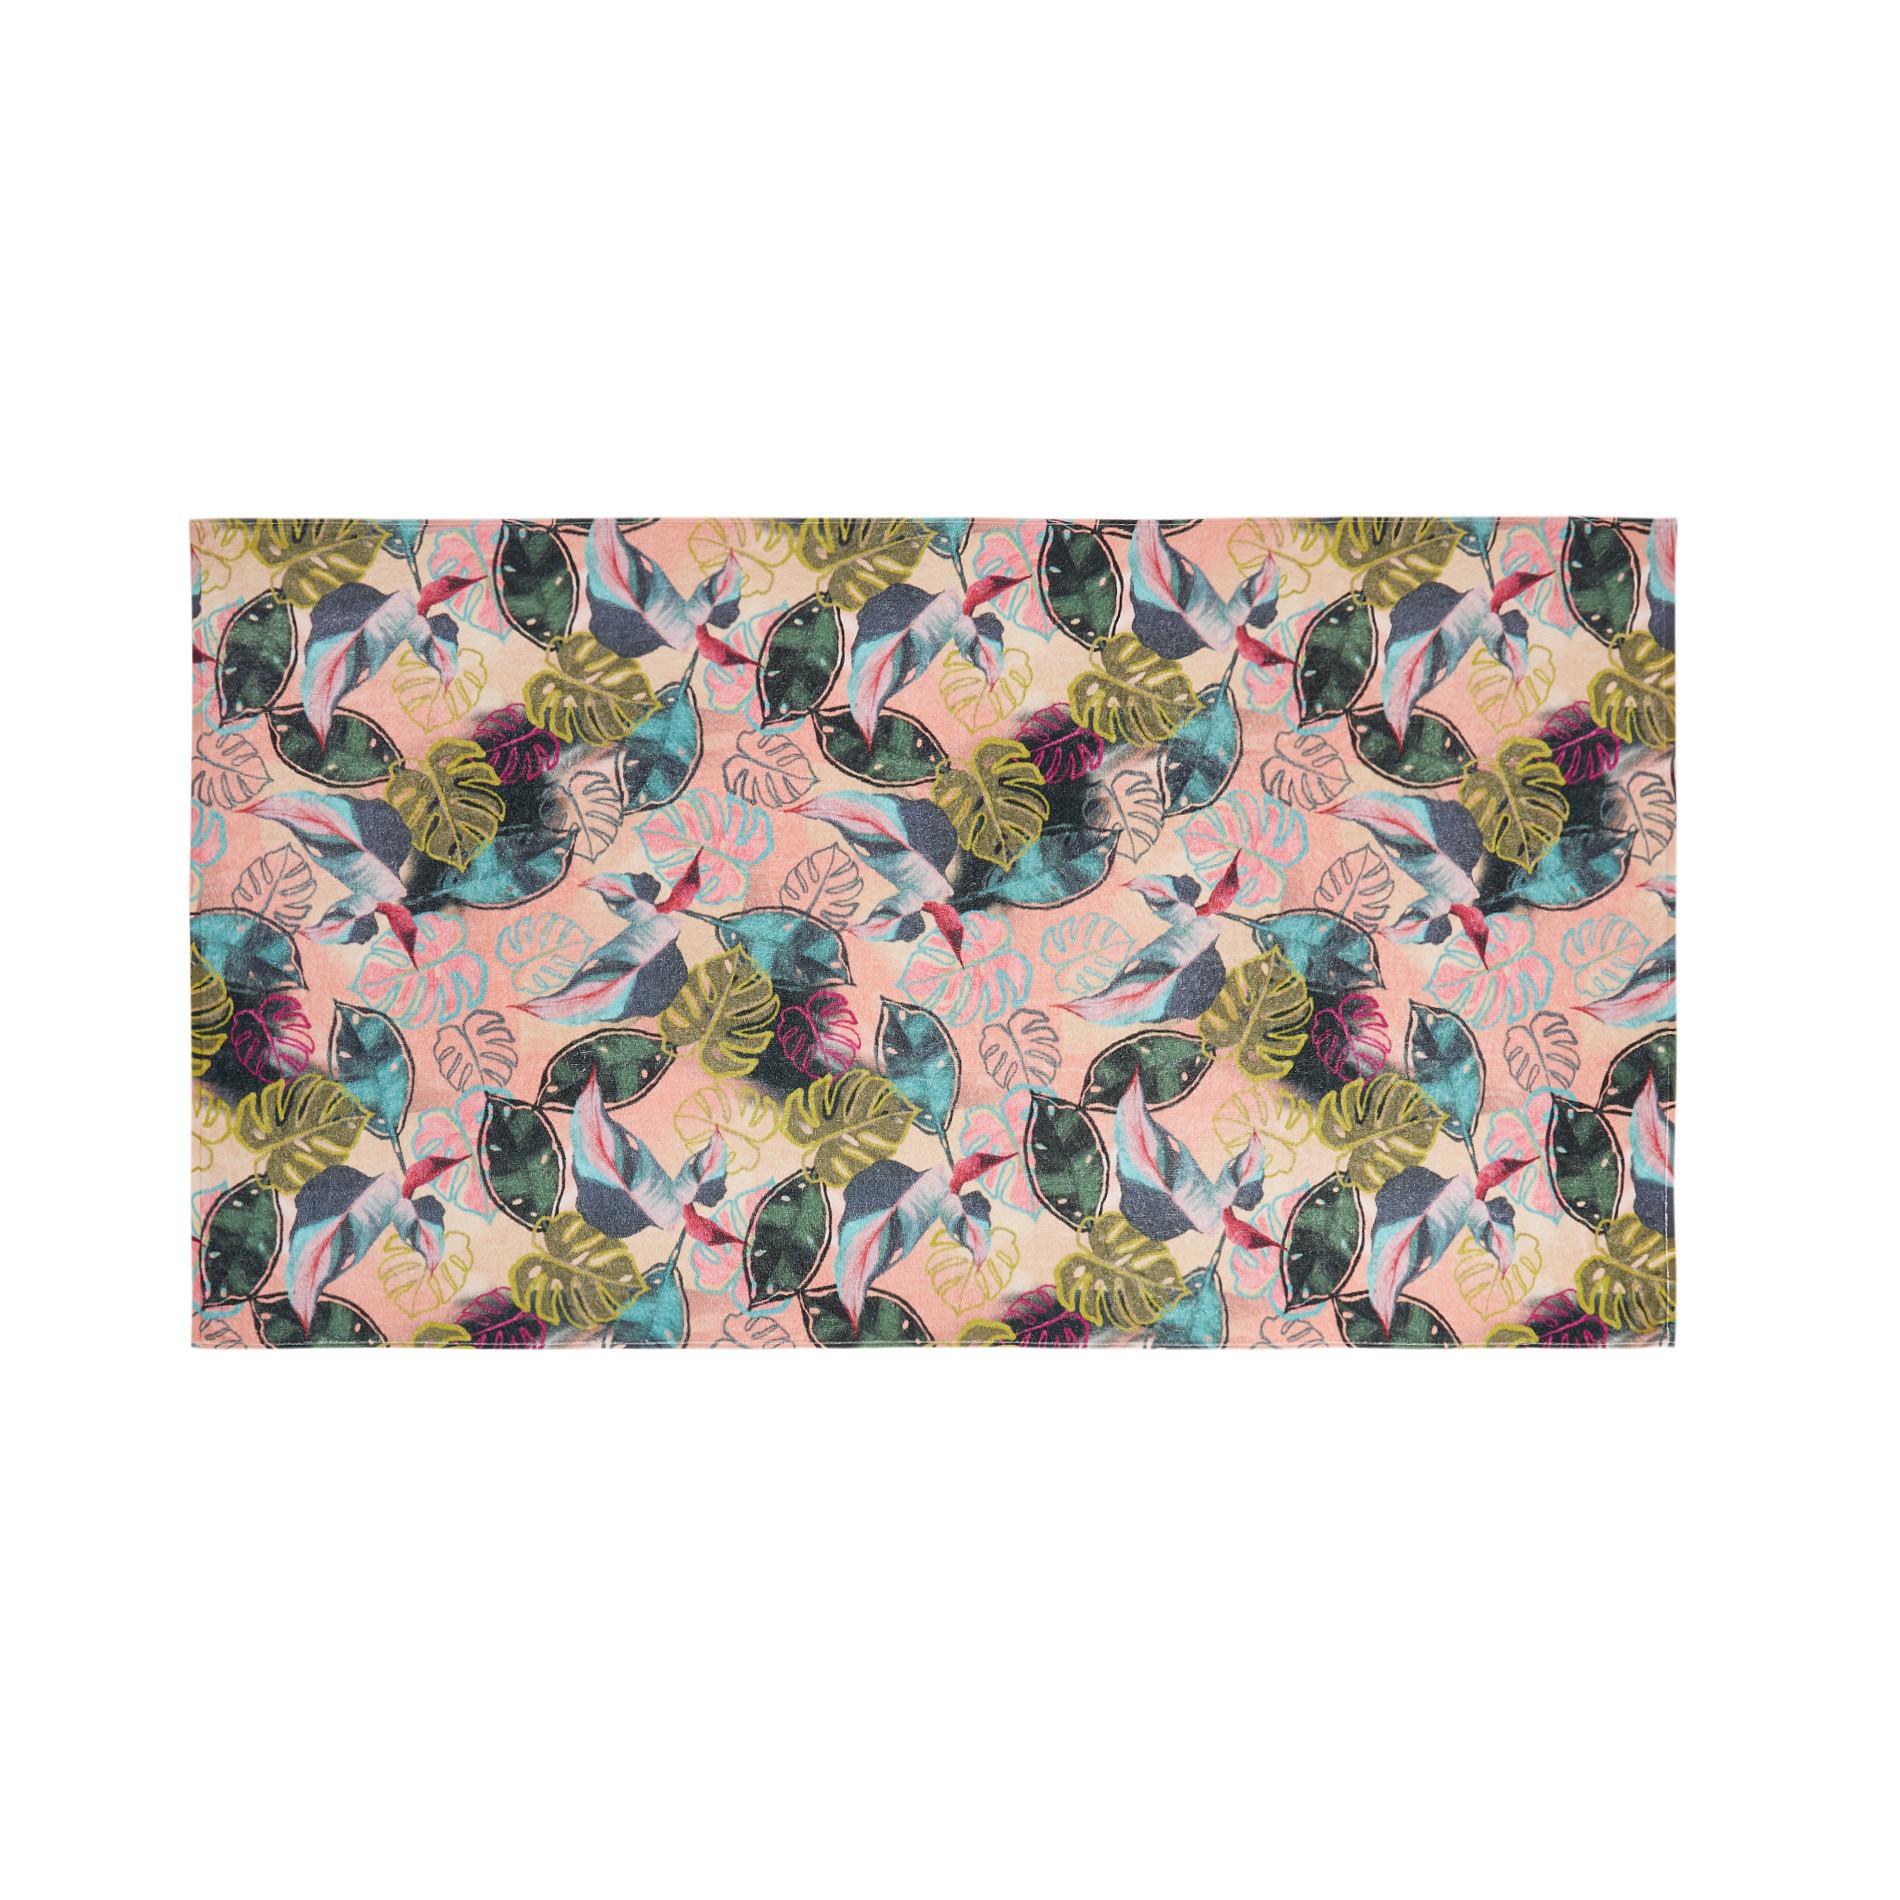 Telo mare cotone velour stampa digitale multicolore, Multicolor, large image number 0